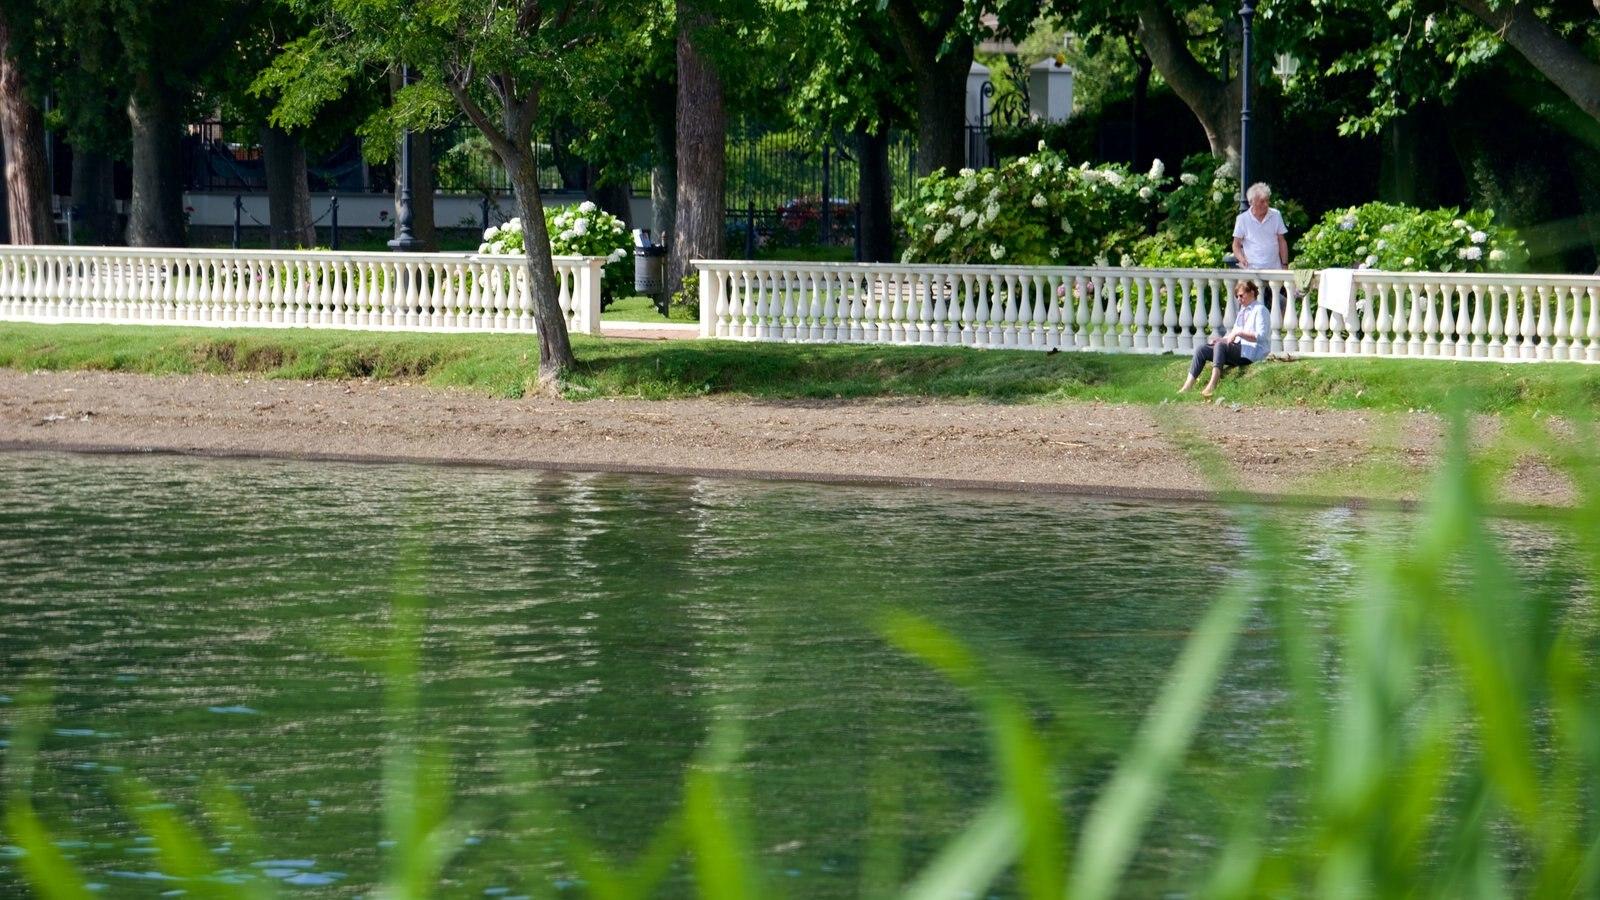 Lake Bolsena which includes a lake or waterhole